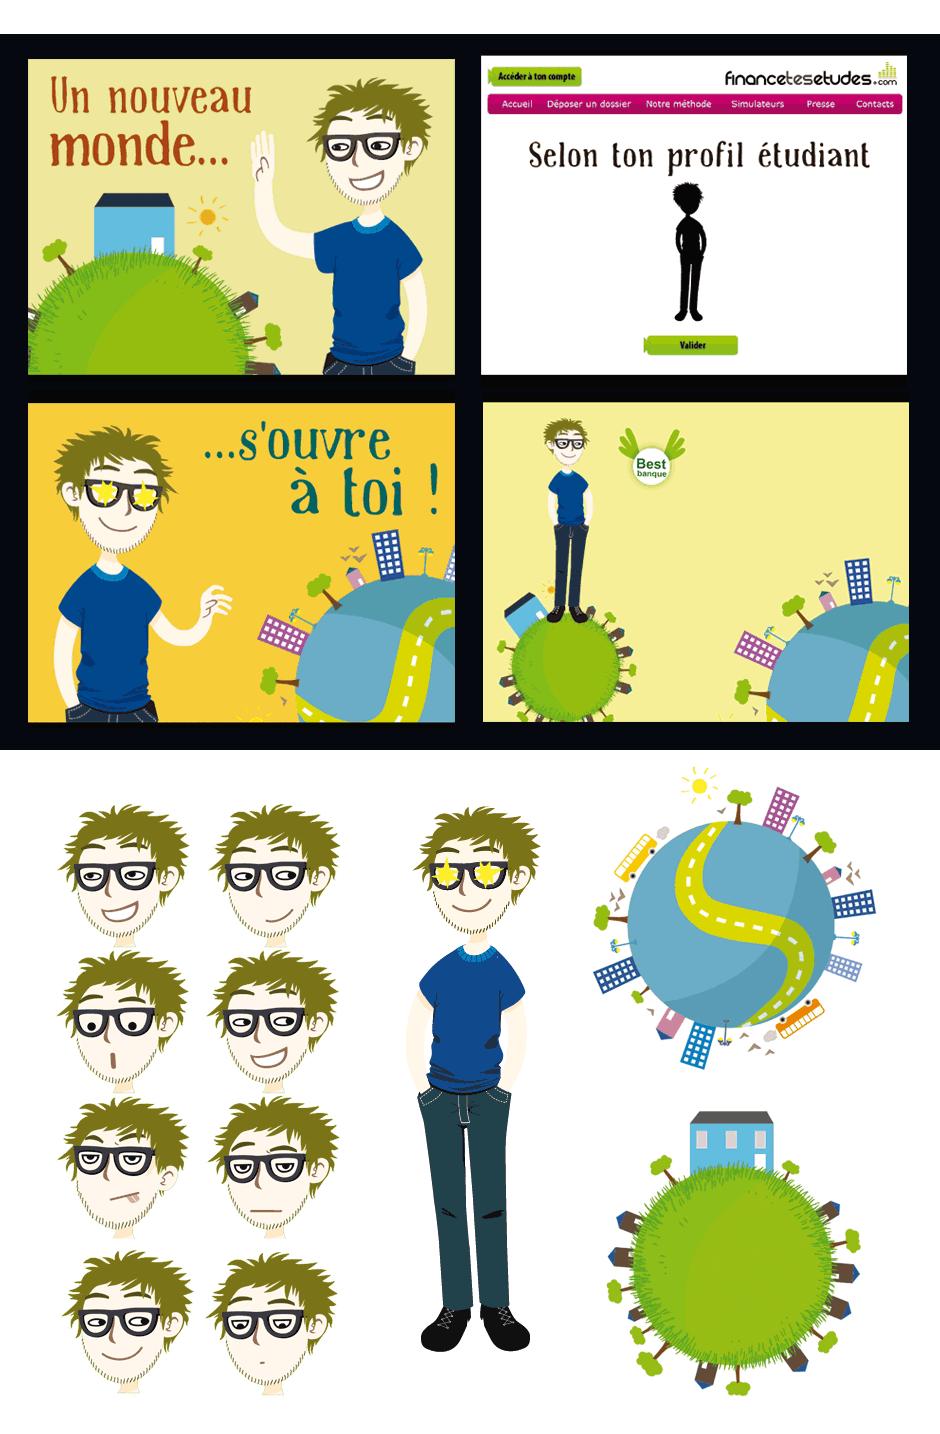 dessin humour visage expressif vidéo pédagogique vectoriel